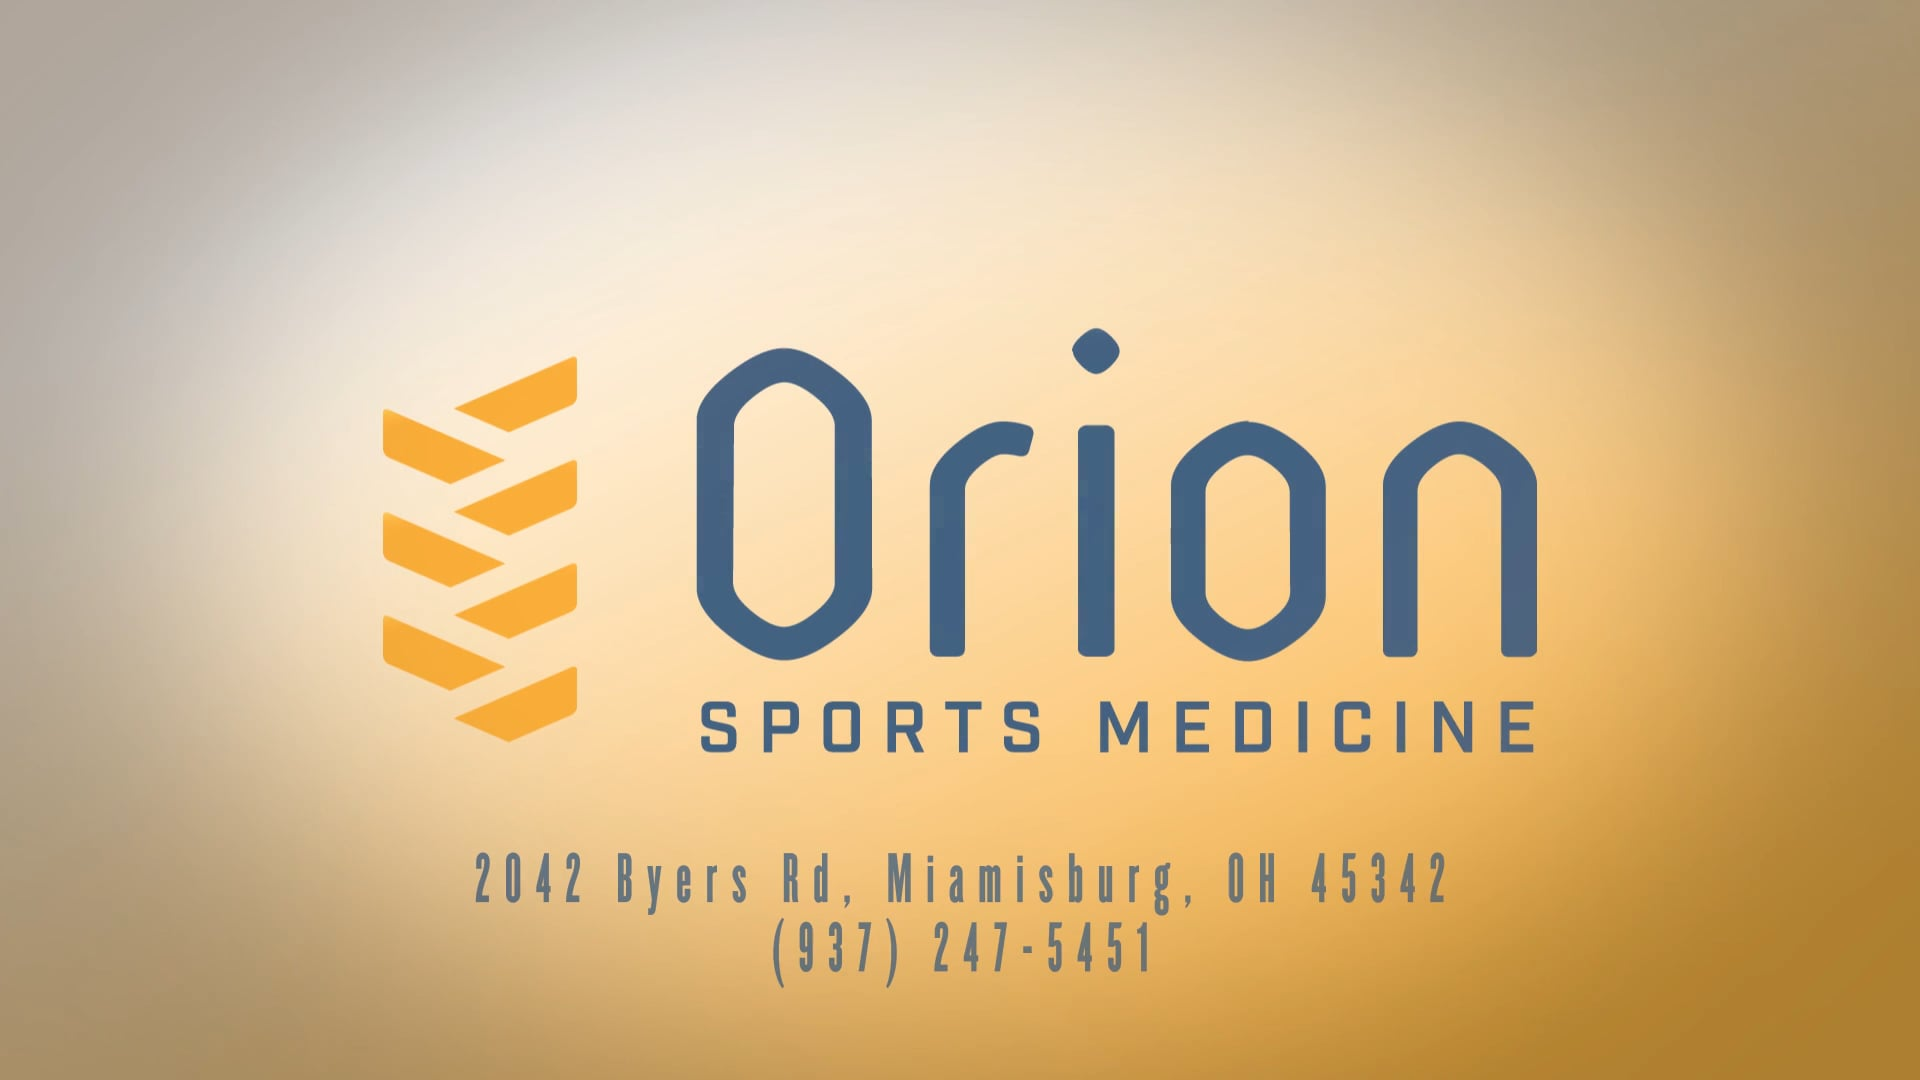 Orion Sports Medicine